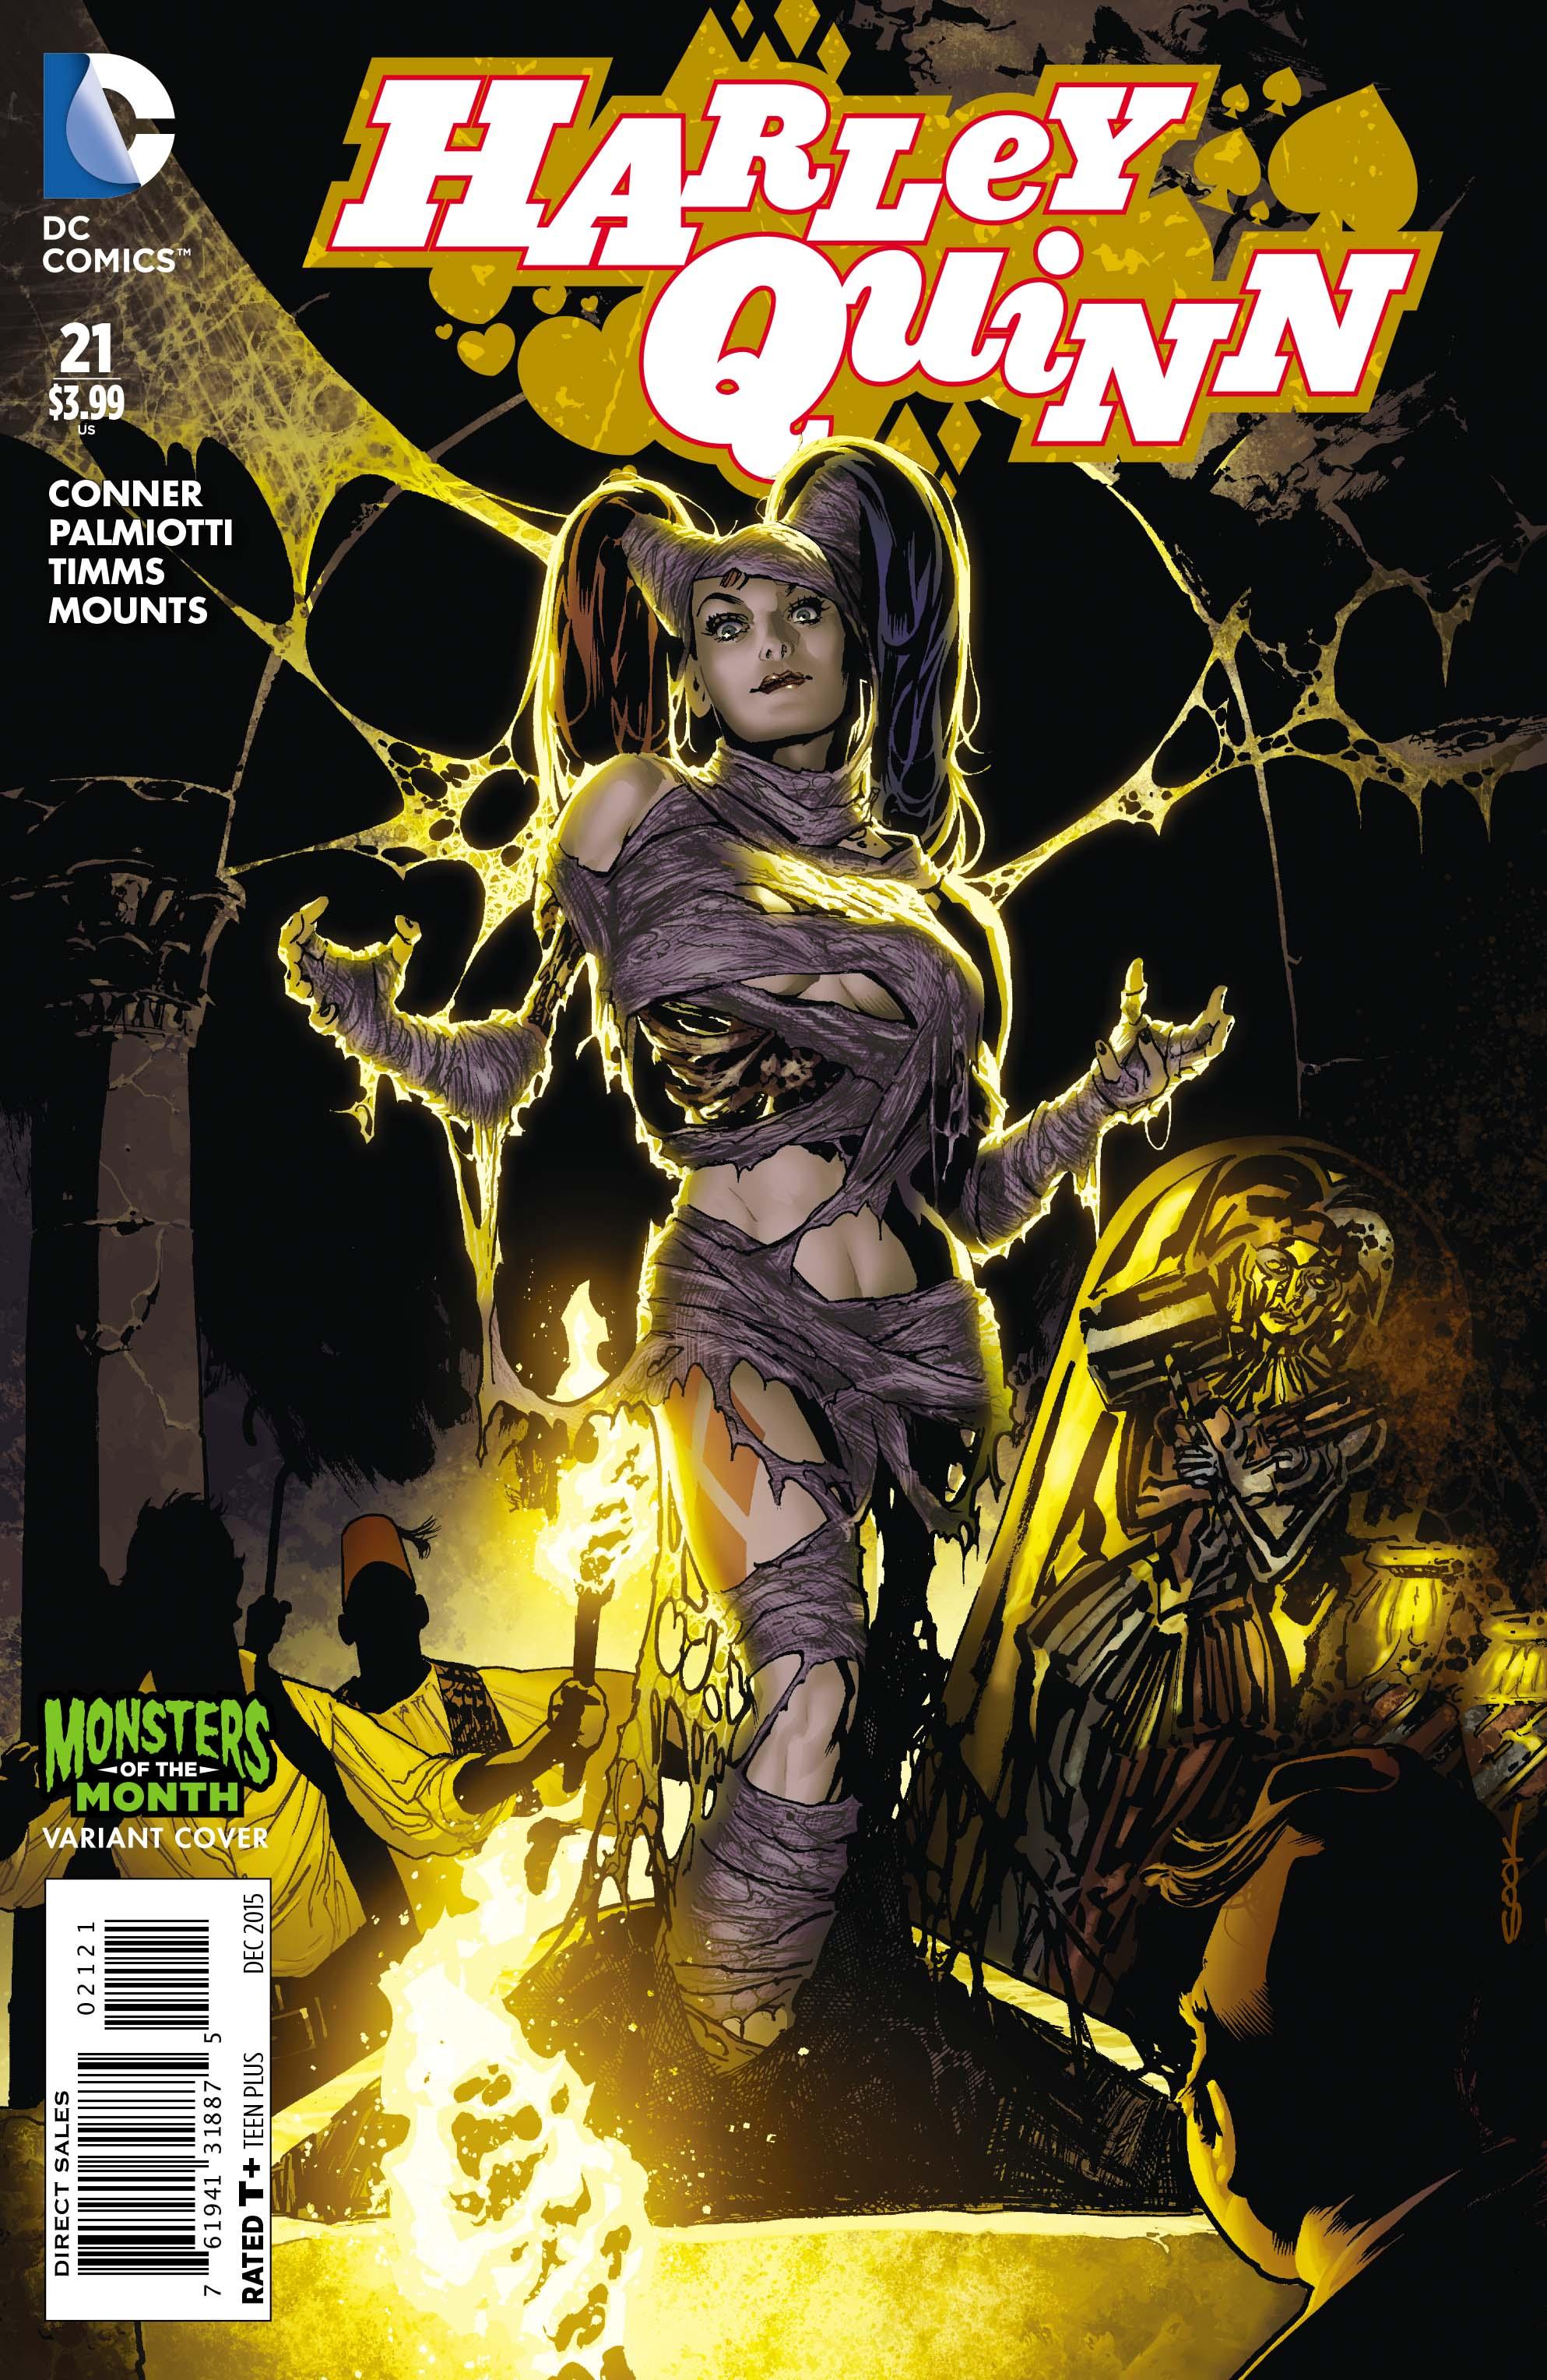 Harley Quinn Vol 2 21 Monsters of the Month Variant.jpg